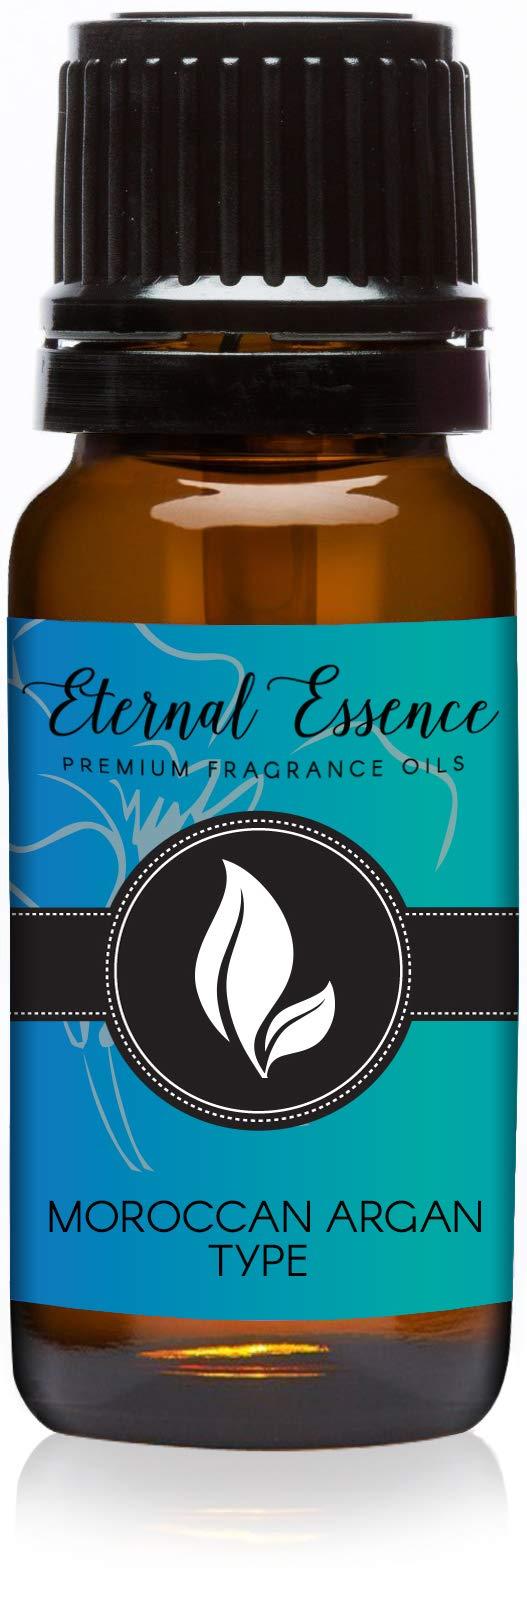 Moroccan Argan Type - Premium Grade Fragrance Oils - 10ml - Scented Oil